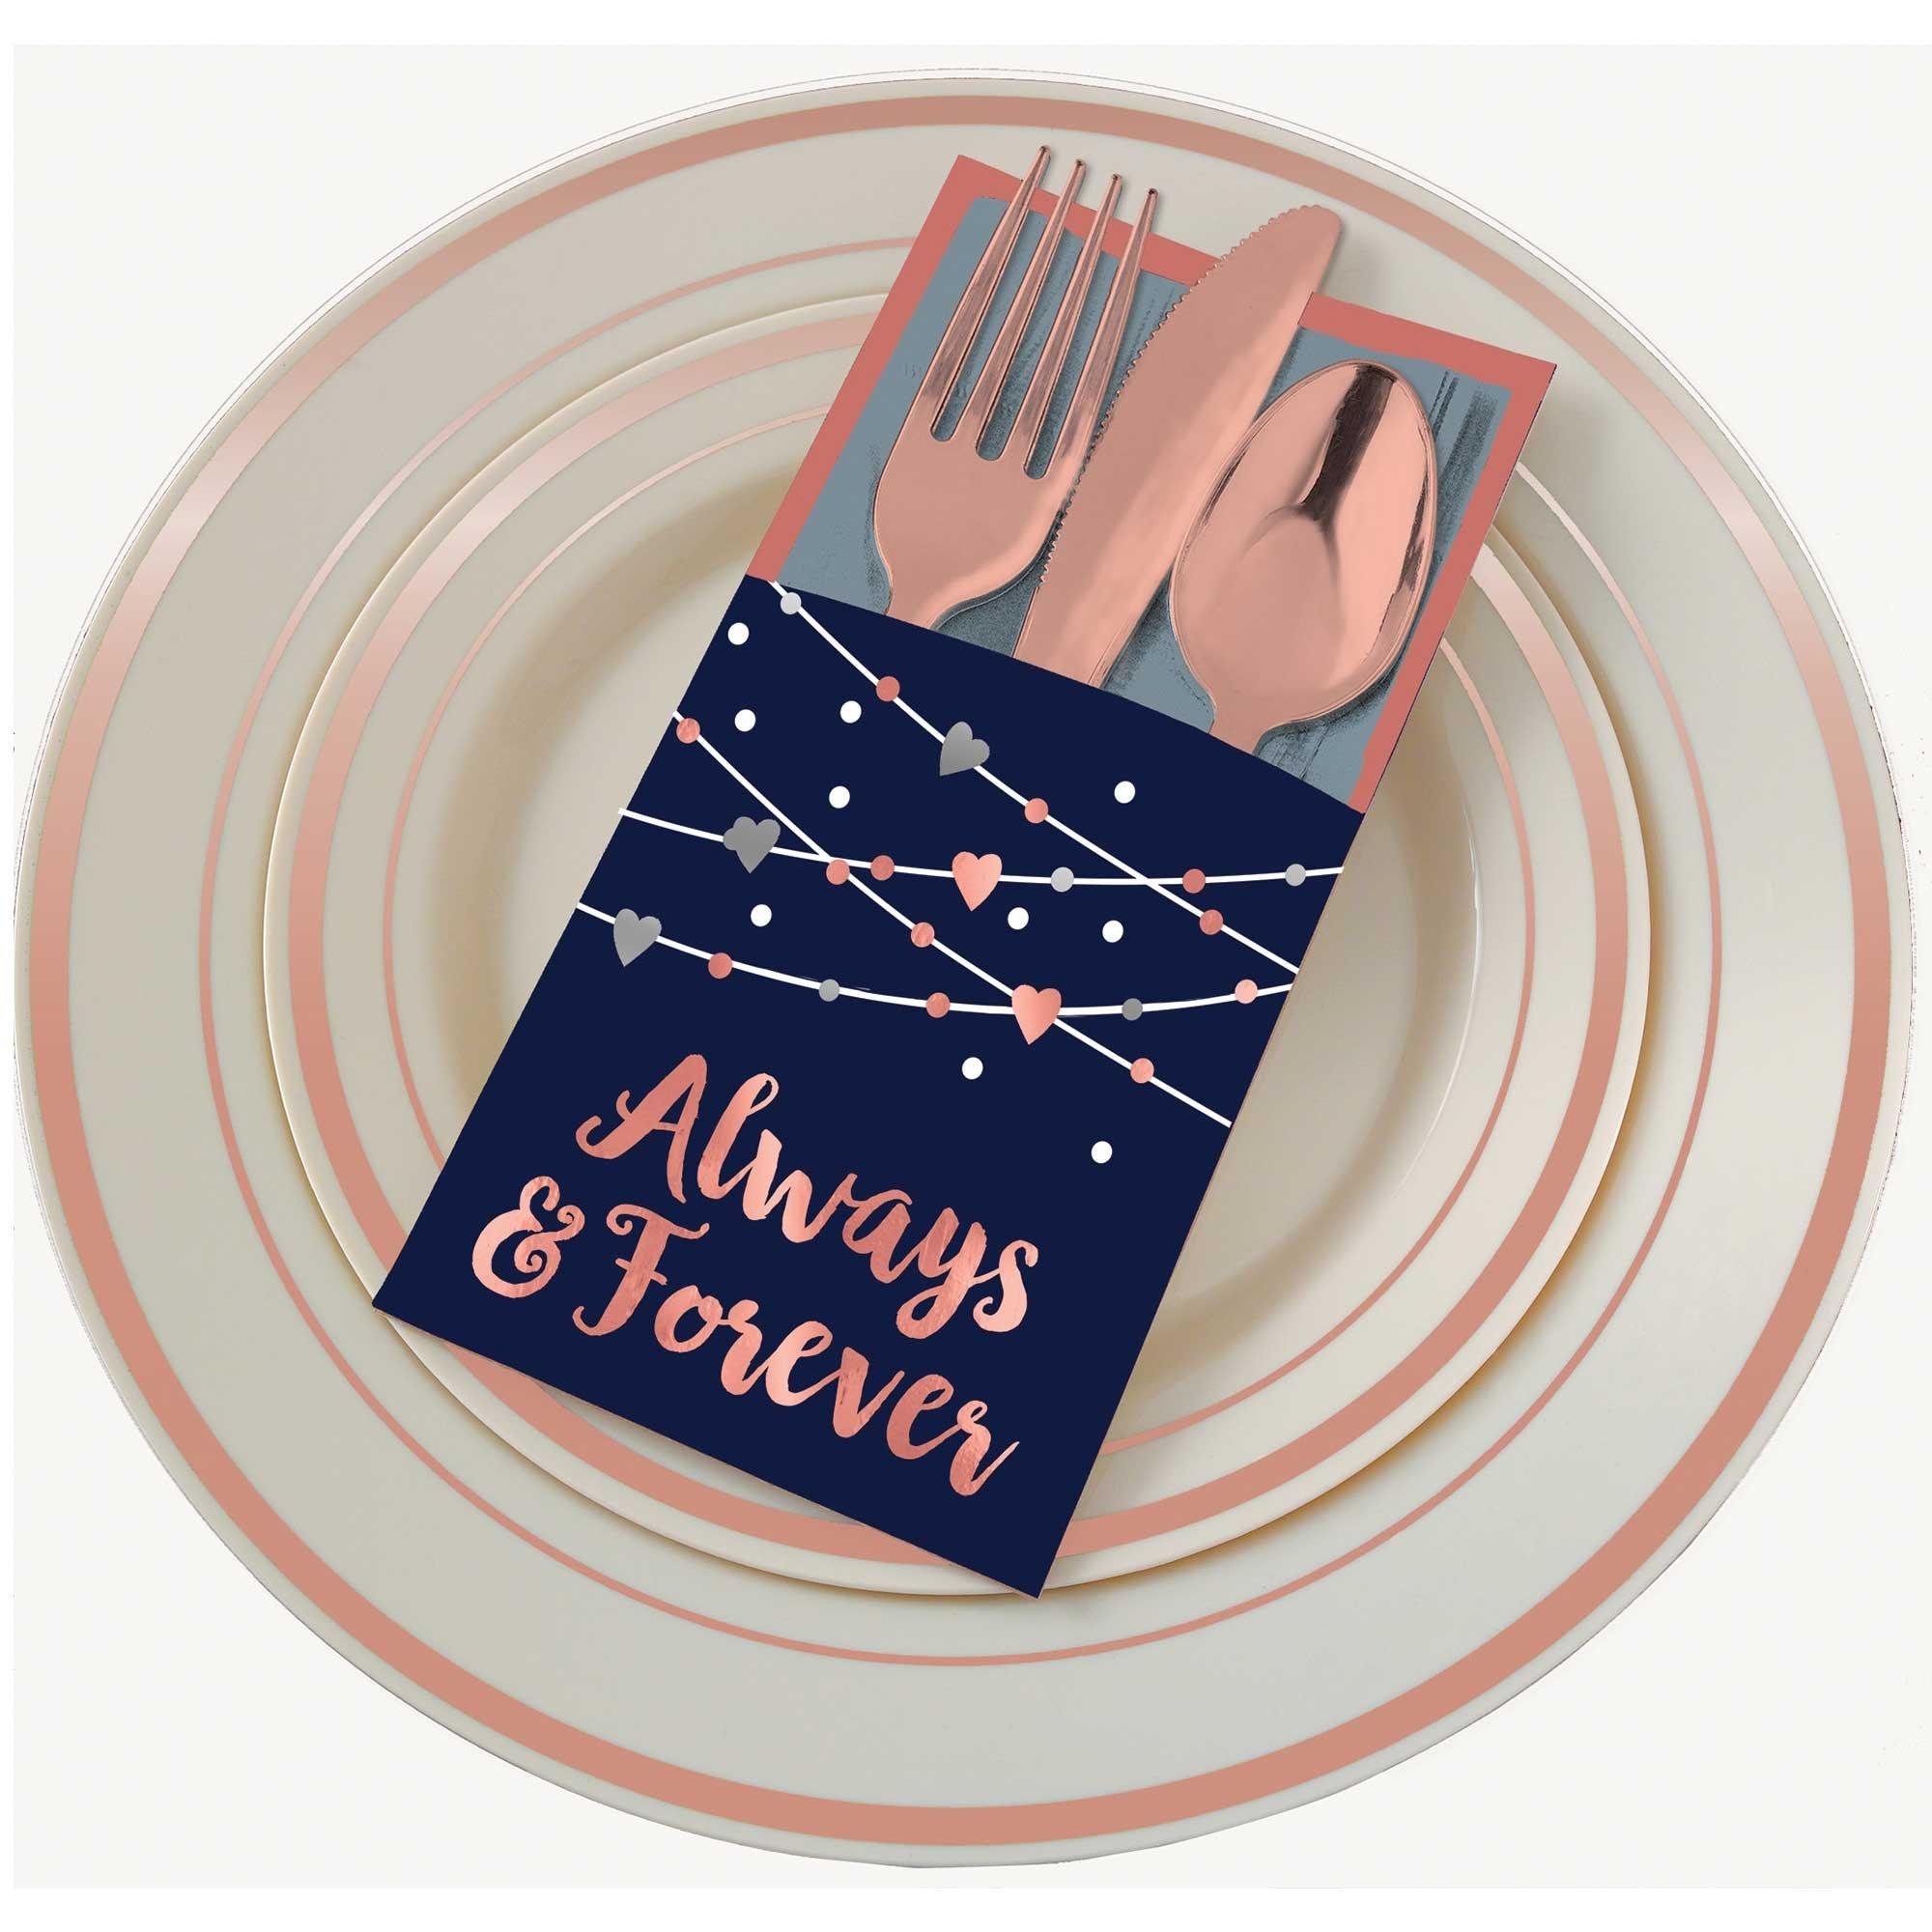 Navy Bride Cutlery Holders Always & Forever Hot Stamped